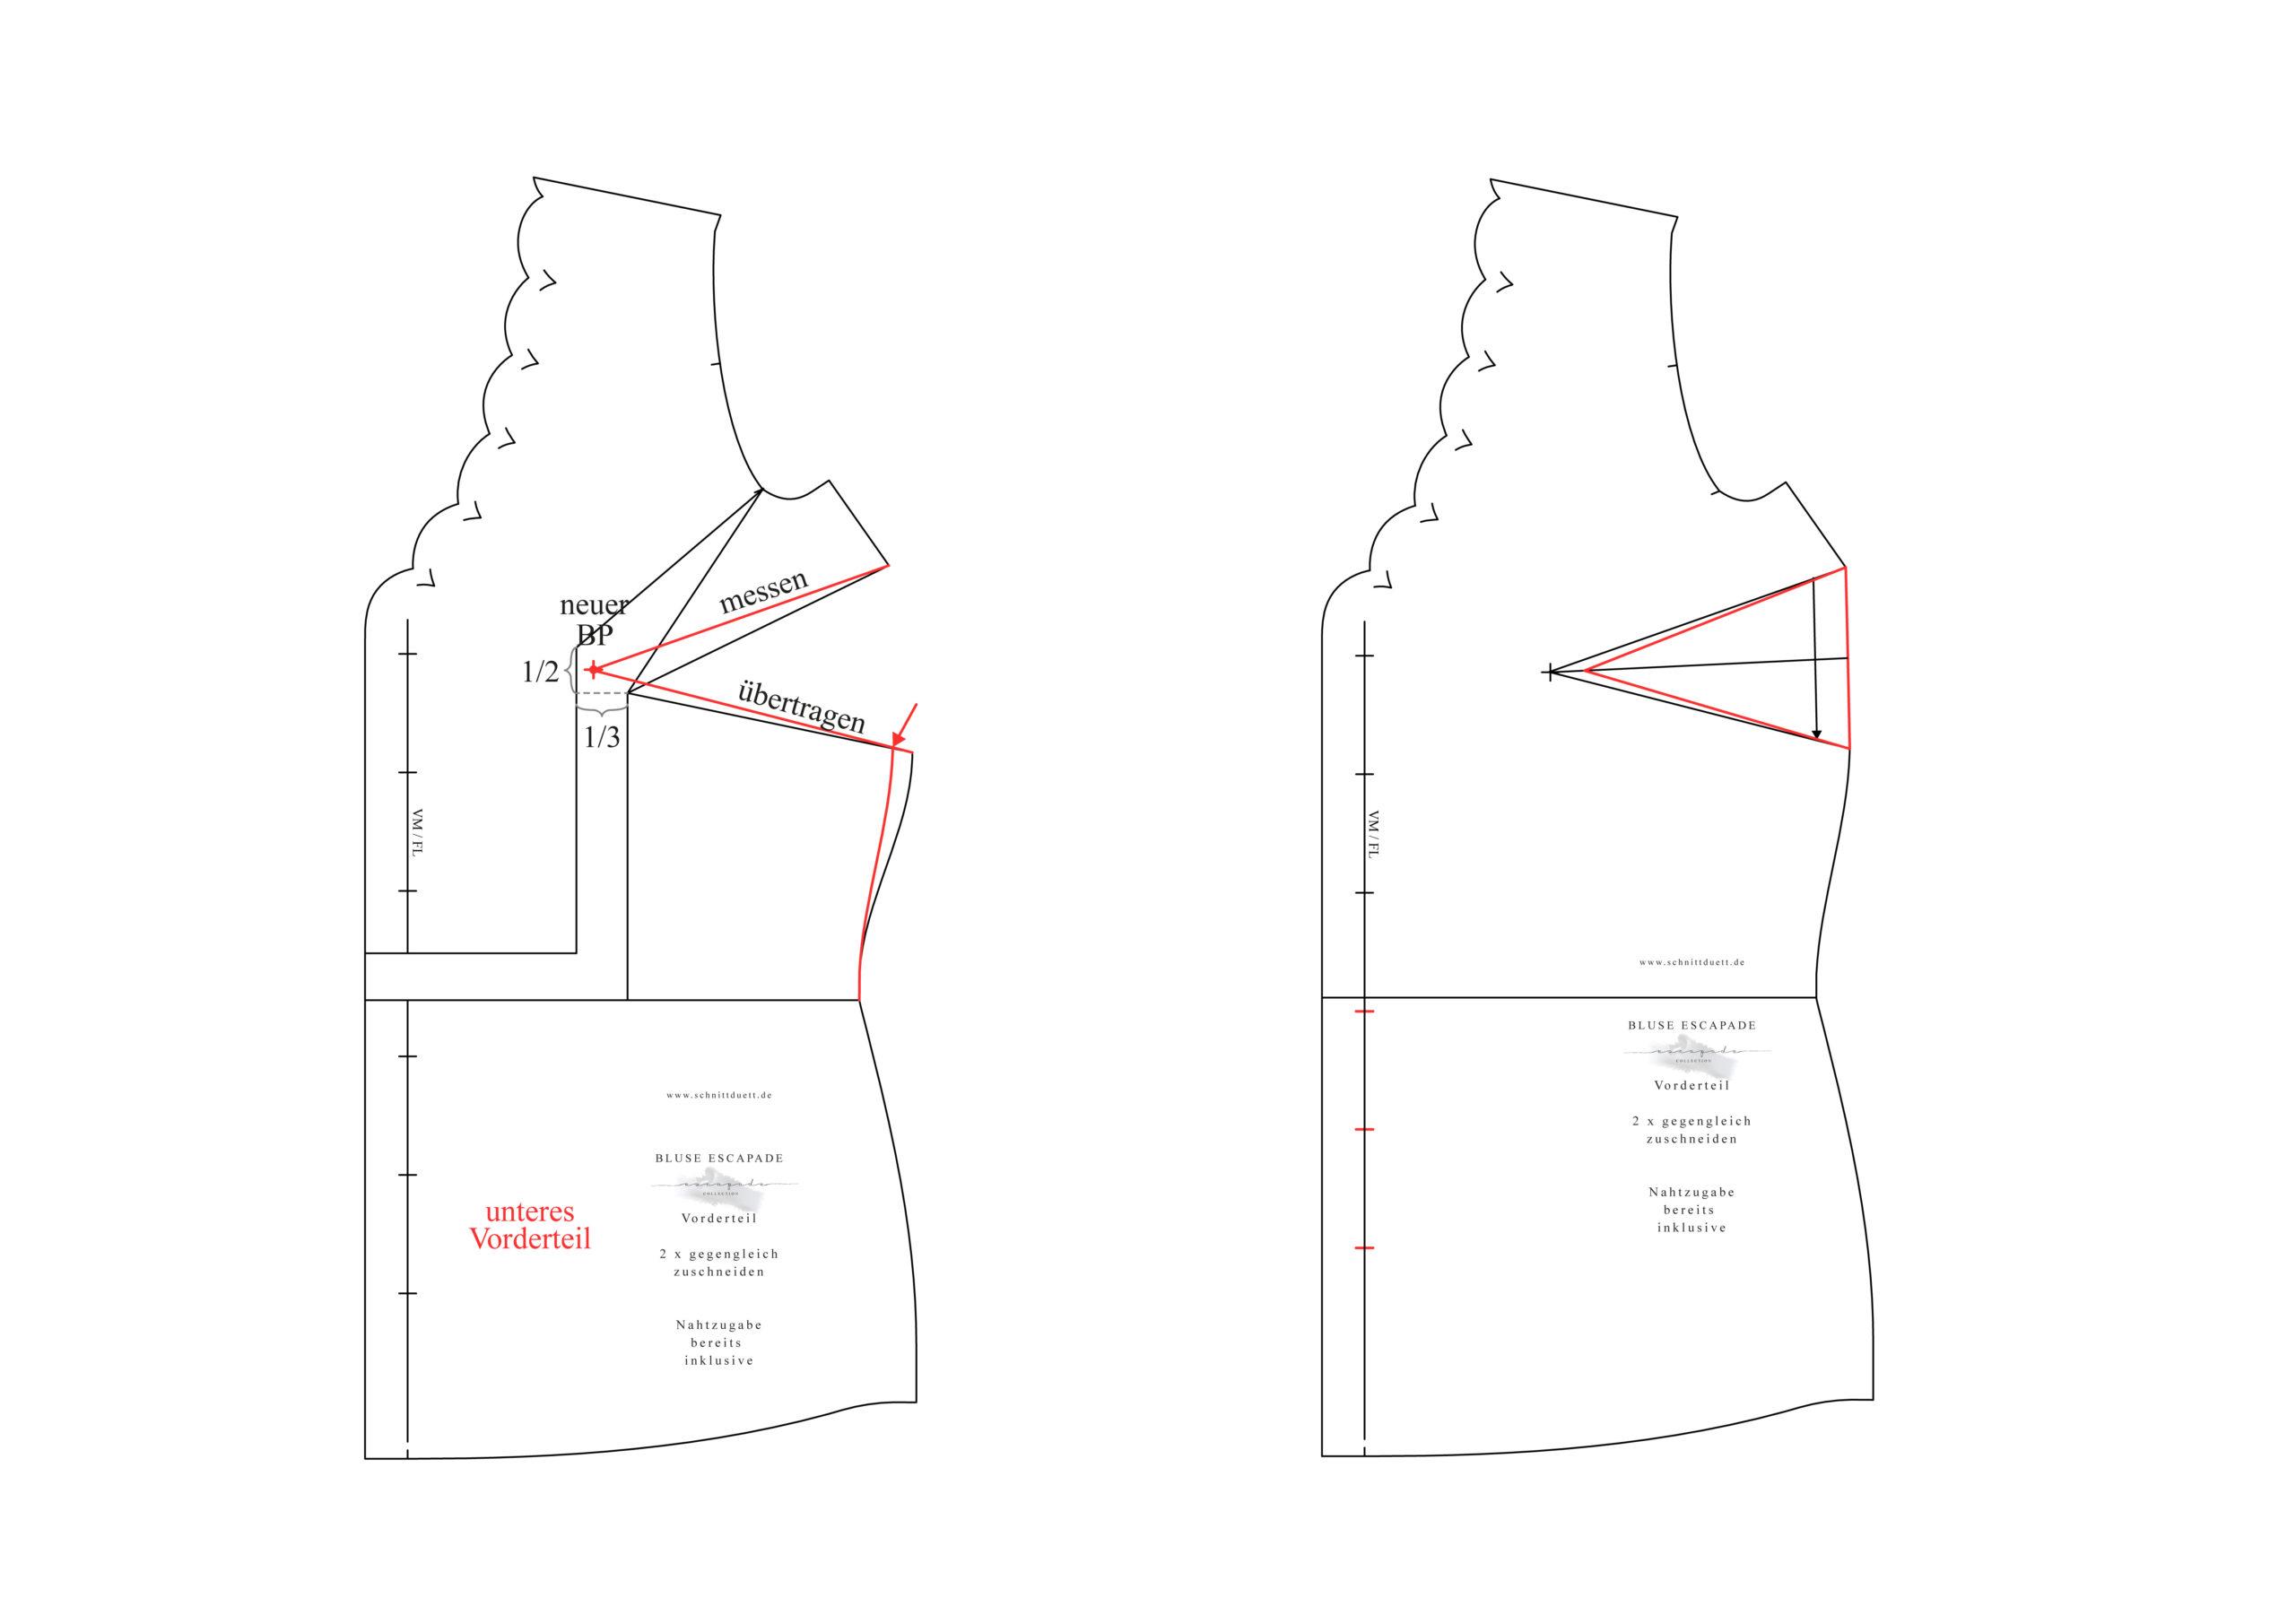 Schnittmuster Bluse anpassen: Full Bust Adjustment - Schnittduett